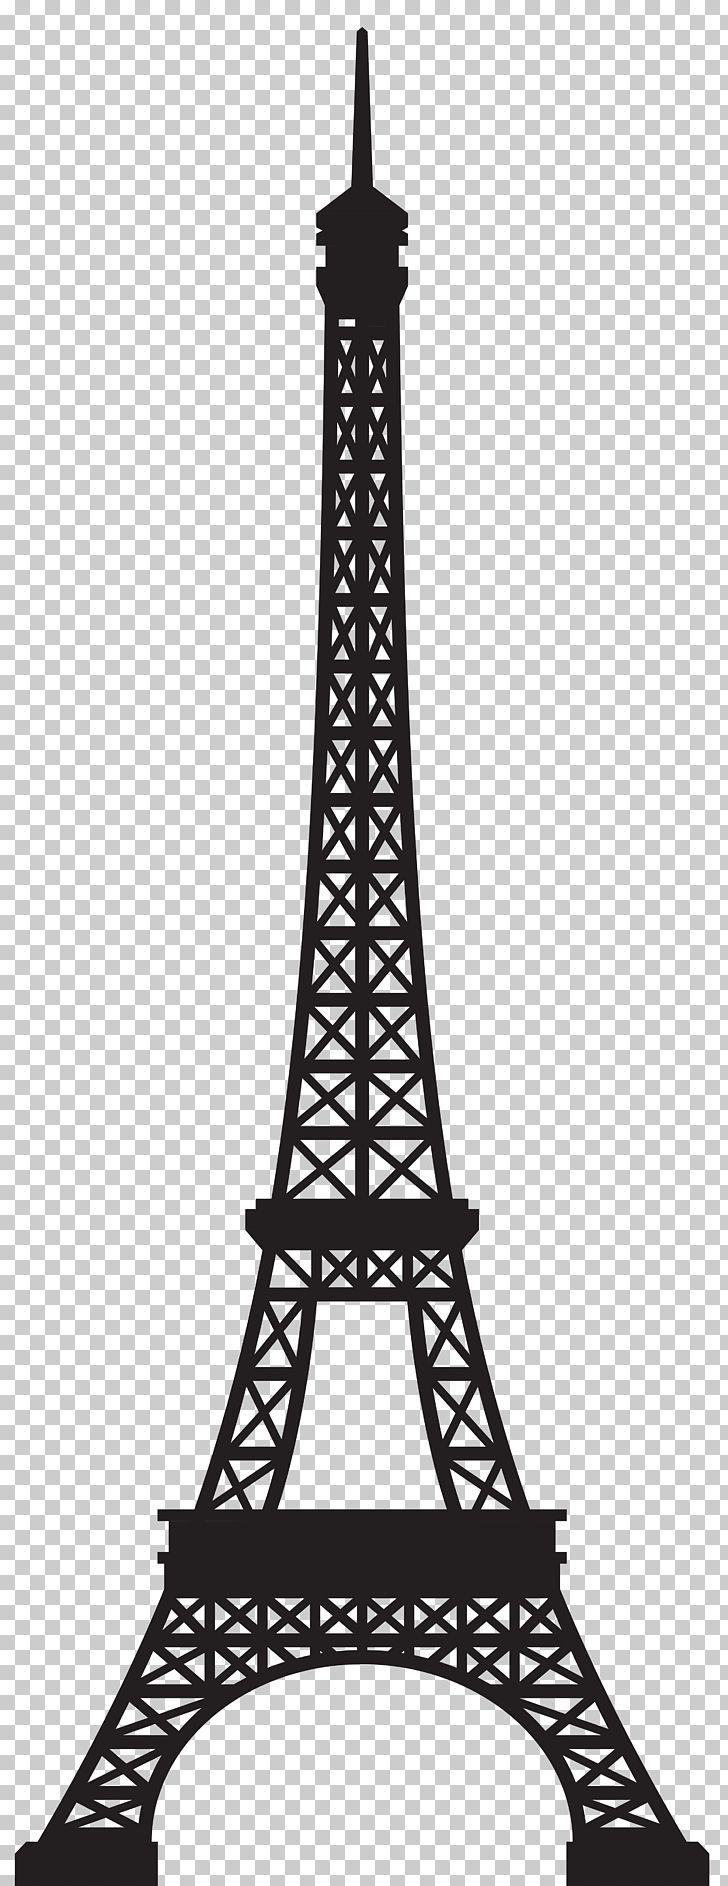 Eiffel Tower Landmark Eiffel Tower Silhouette Black Eiffel Tower Illustration Png Clipart Eiffel Tower Illustration Eiffel Tower Silhouette Clip Art